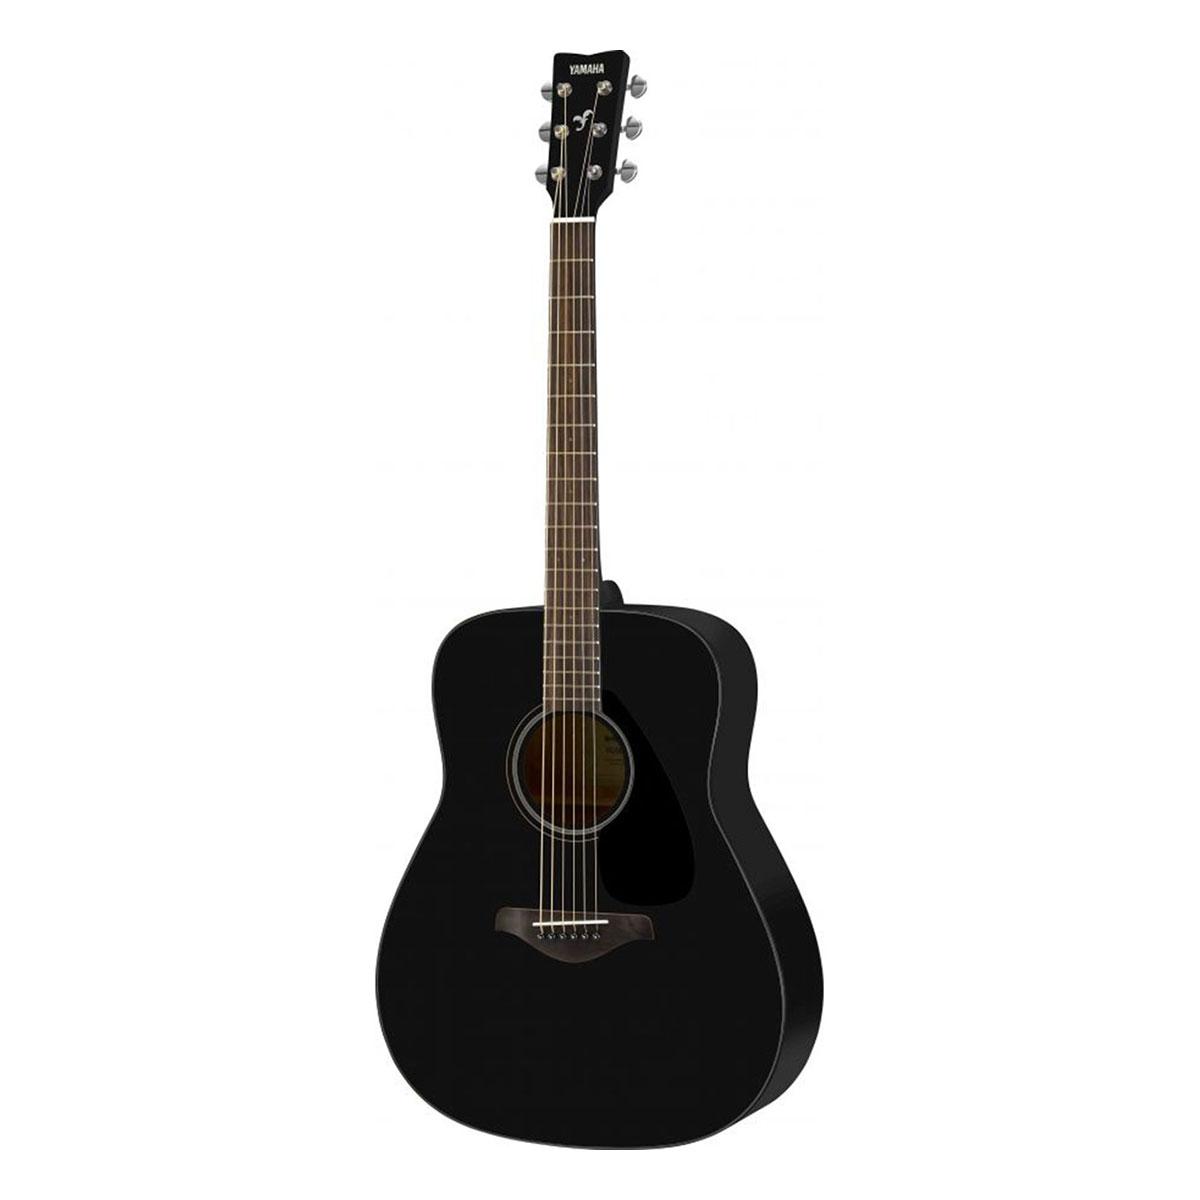 Yamaha - GFG800BL black - guitare folk T